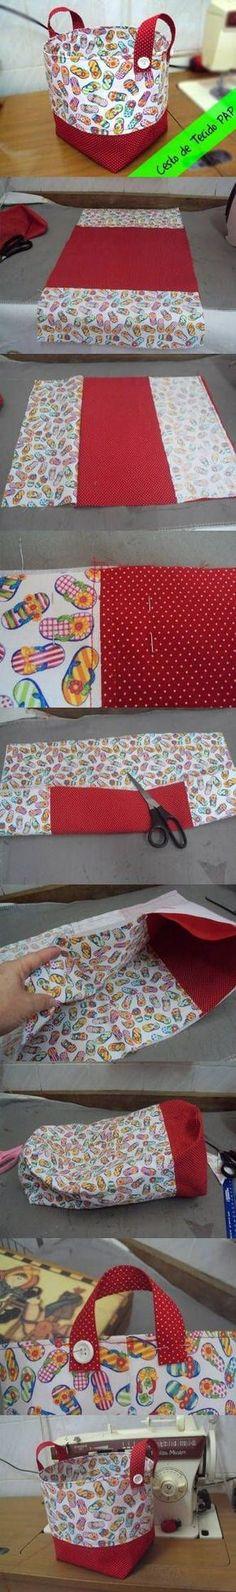 DIY Easy Fabric Basket DIY Projects